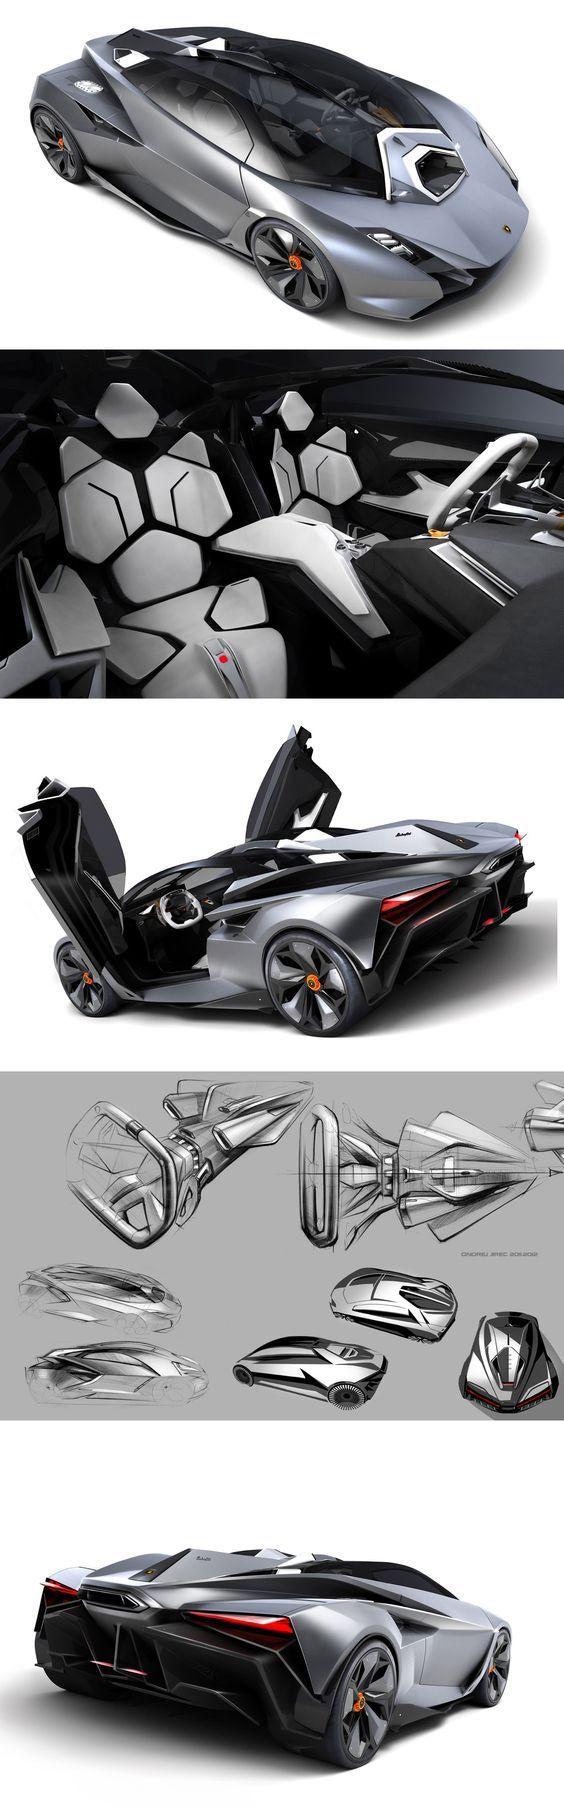 Lamborghini Perdigon | design sketches & 3D renderings